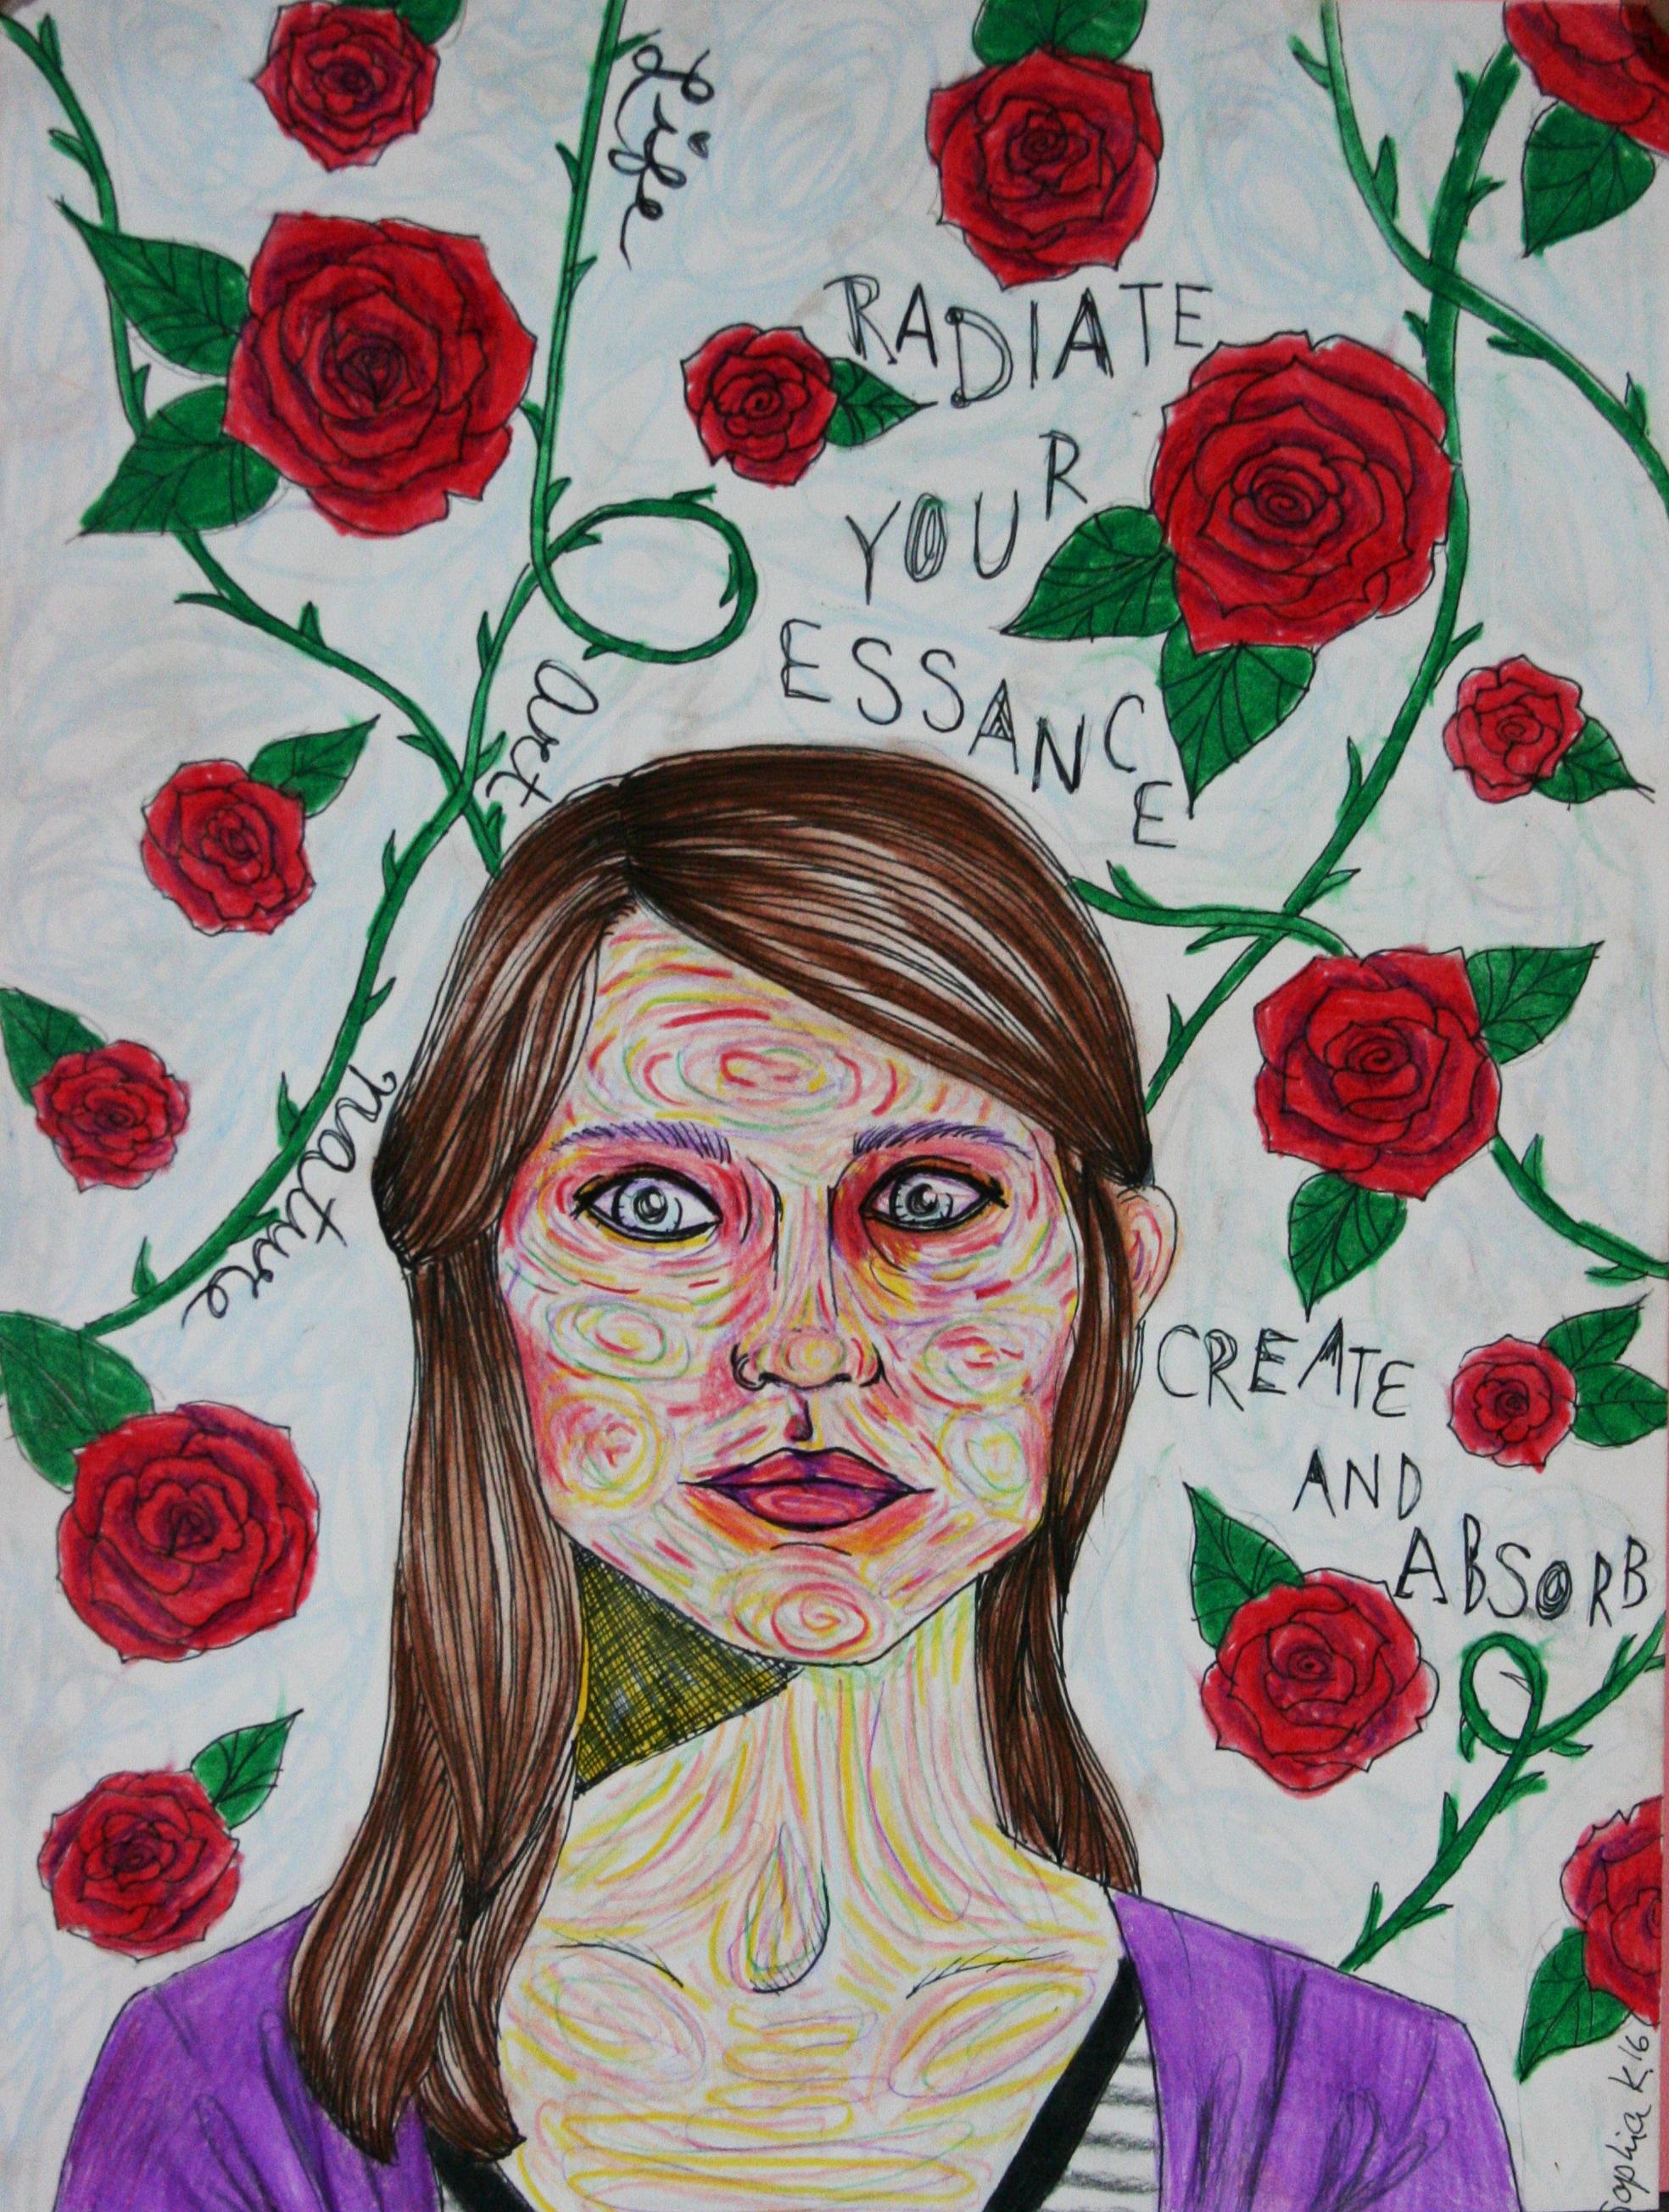 Sophia Kilgallon did this 3-hour mixed media drawing.